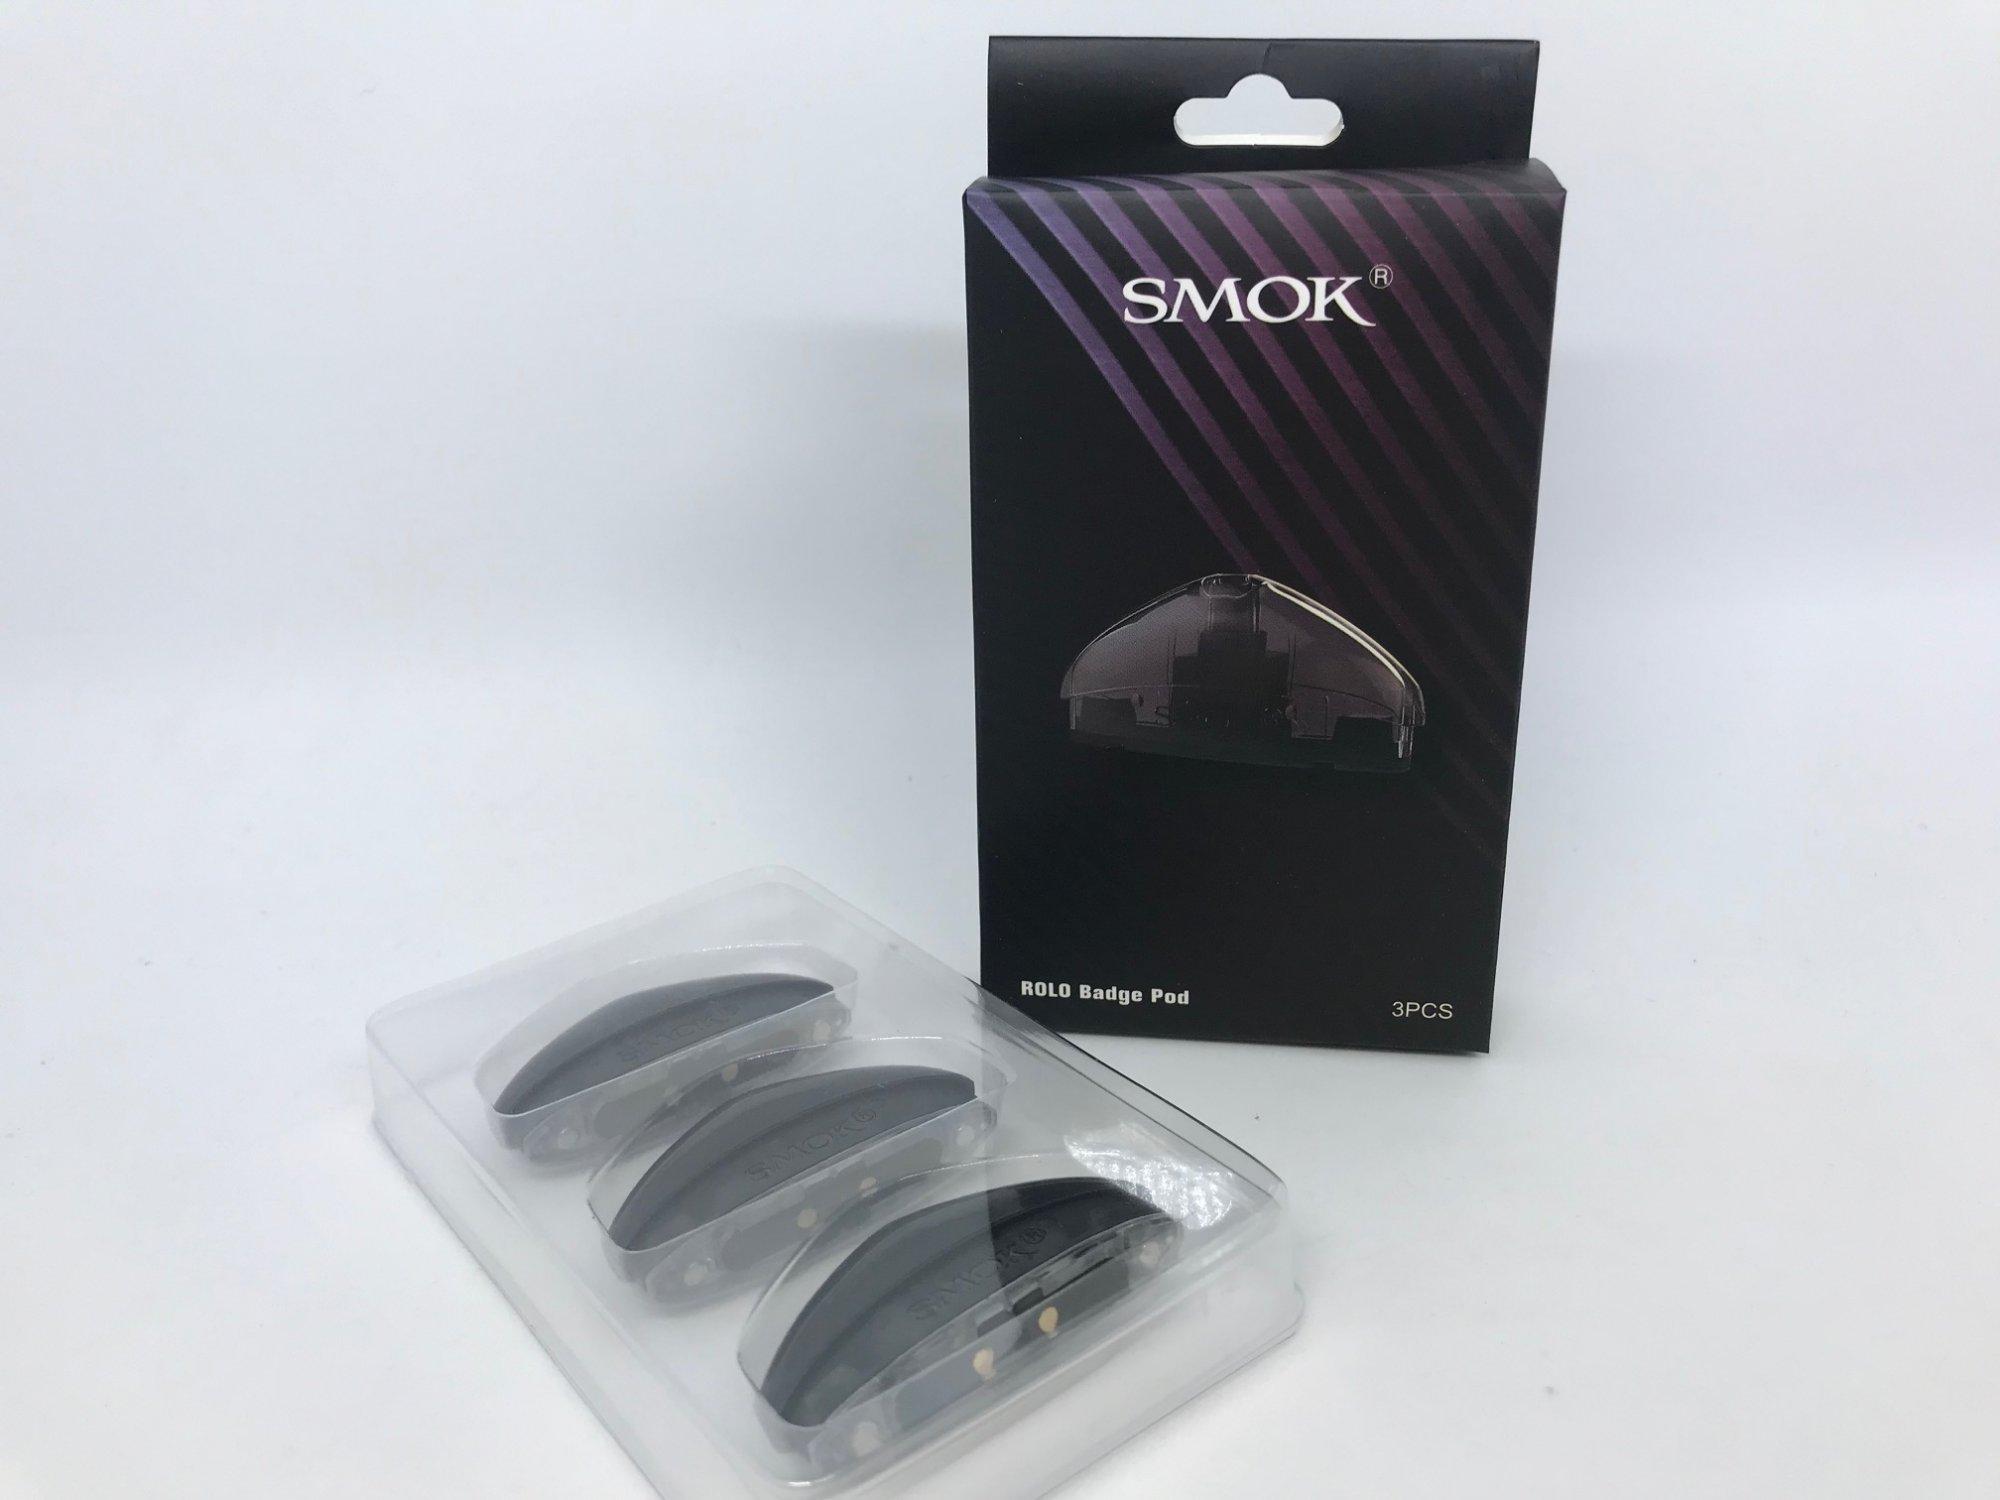 Smok Rolo Badge Pod 3-Pack